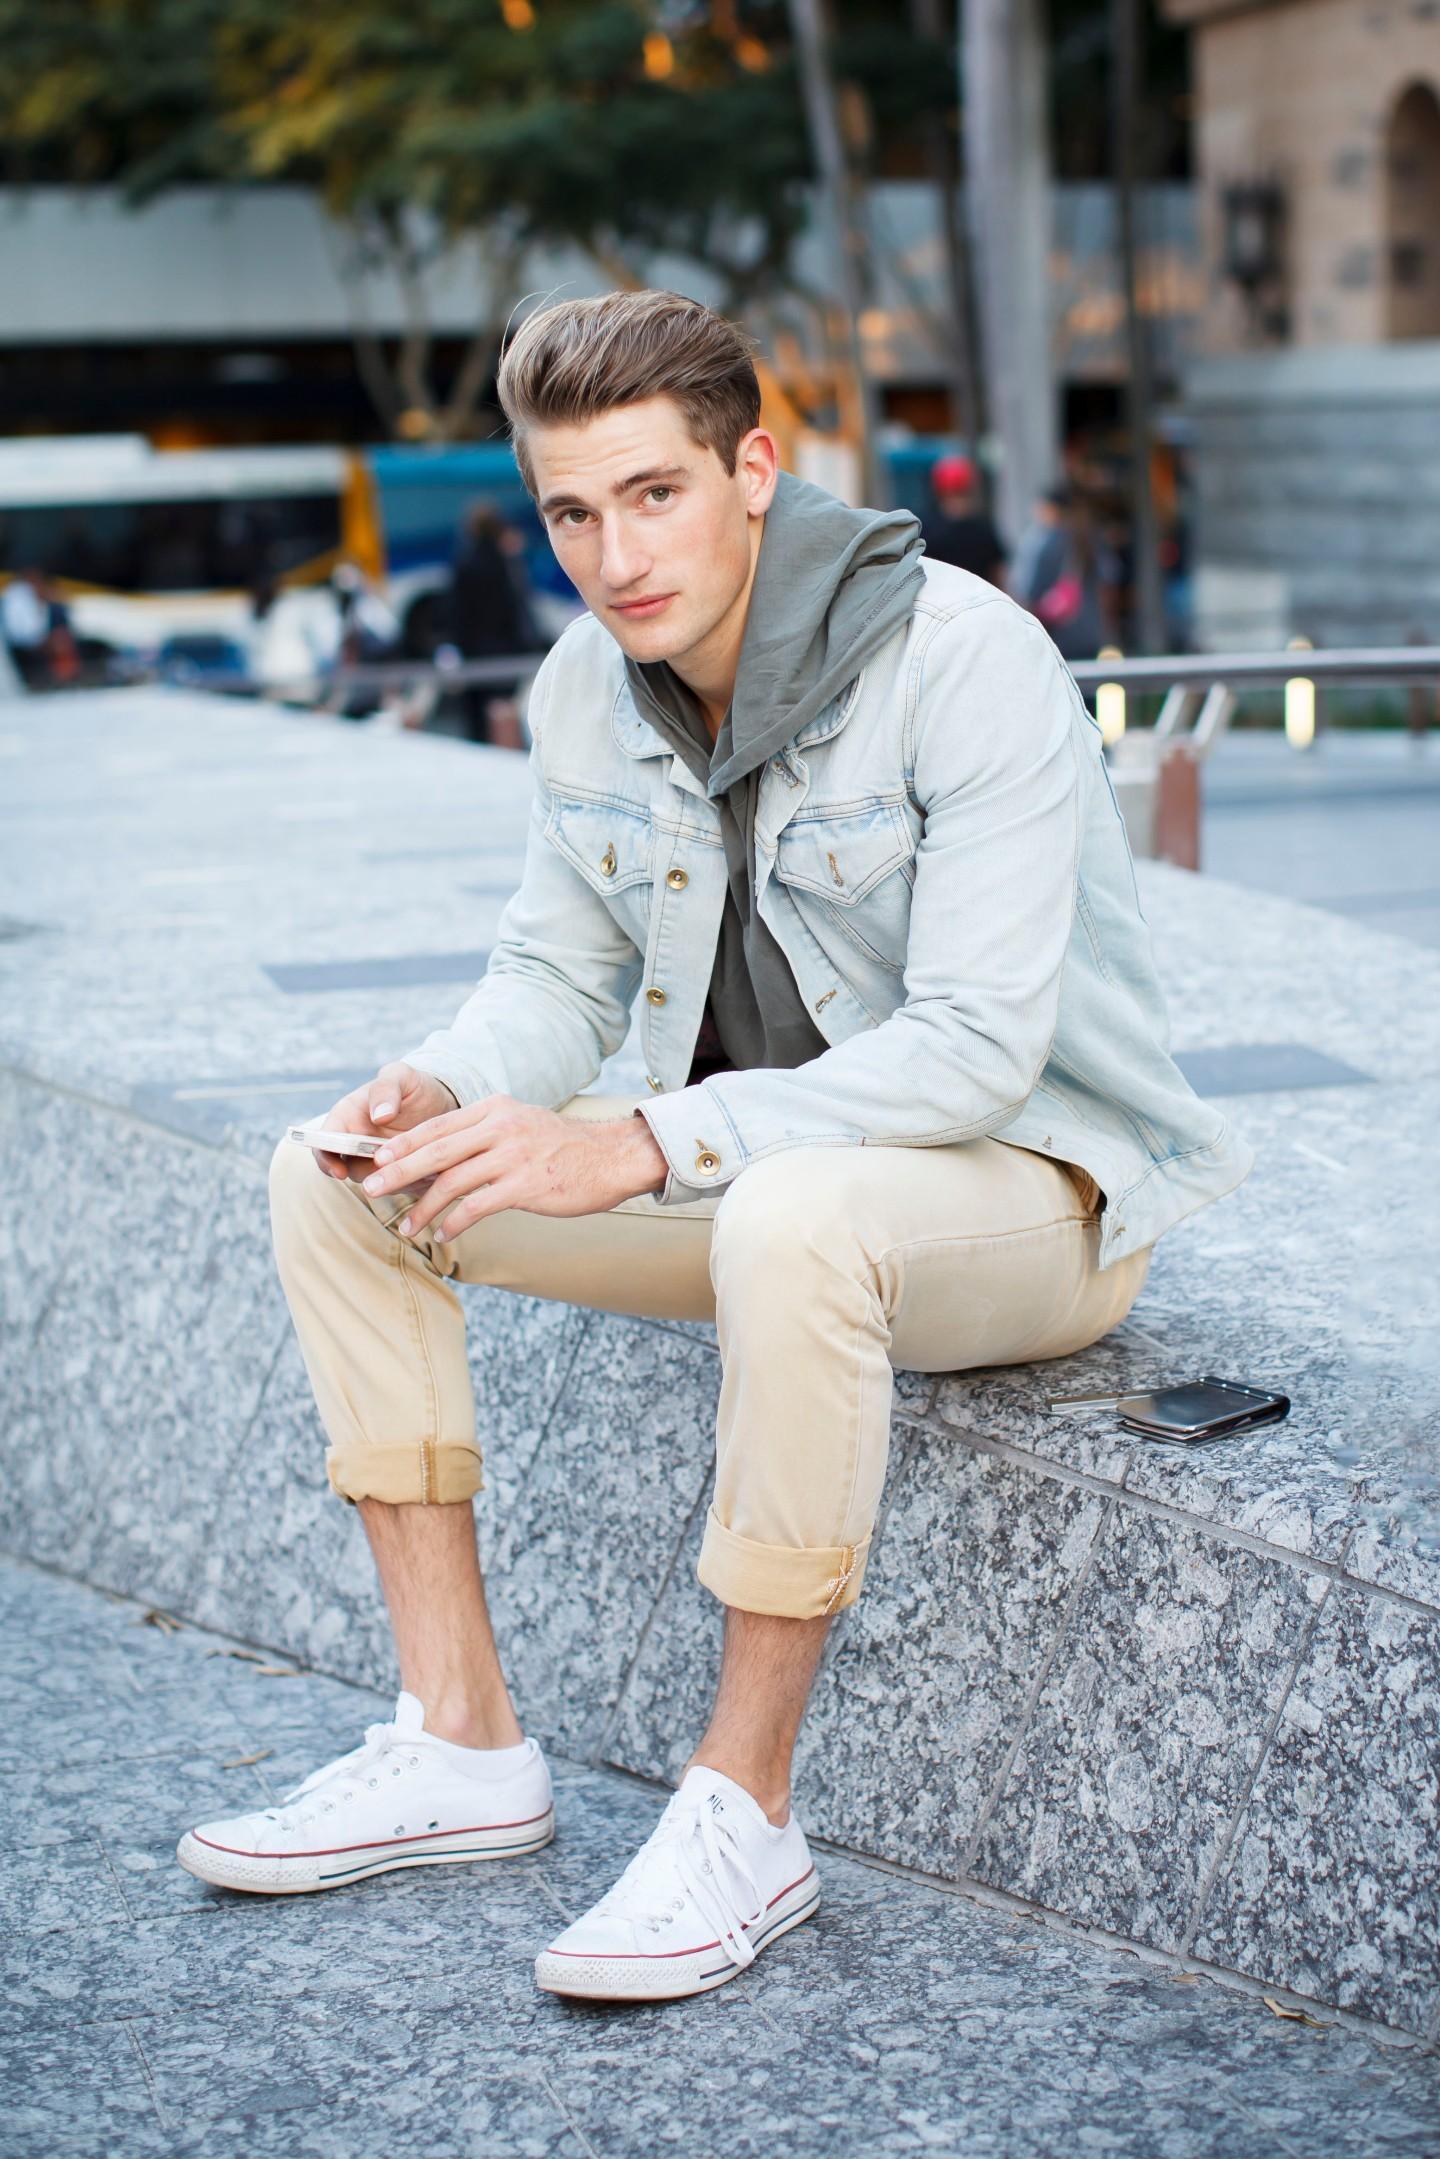 Denim Jacket, light wash denim, slim fit chinos, canvas sneakers, hooded top, your ensemble, yourensemble, yourensemble.com